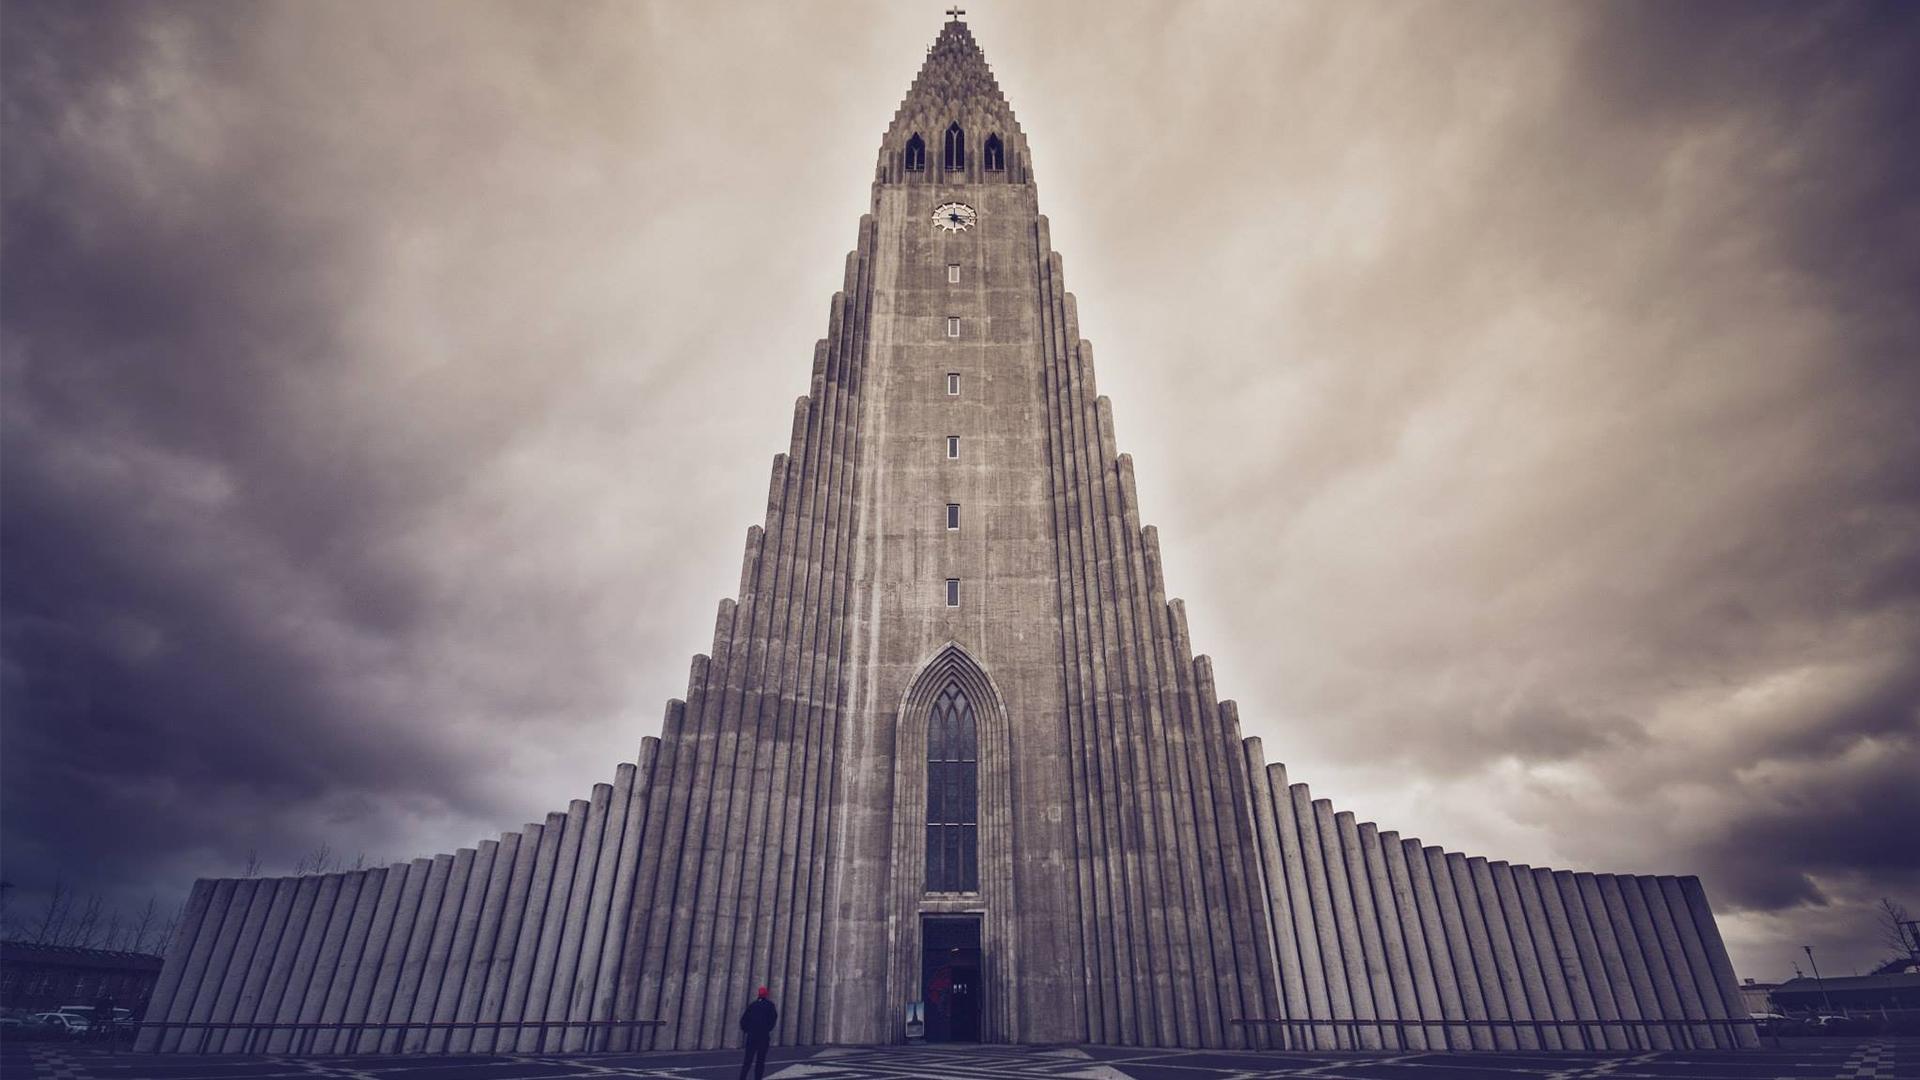 Hallgrimskirkja_Reykjavik_2_16_9